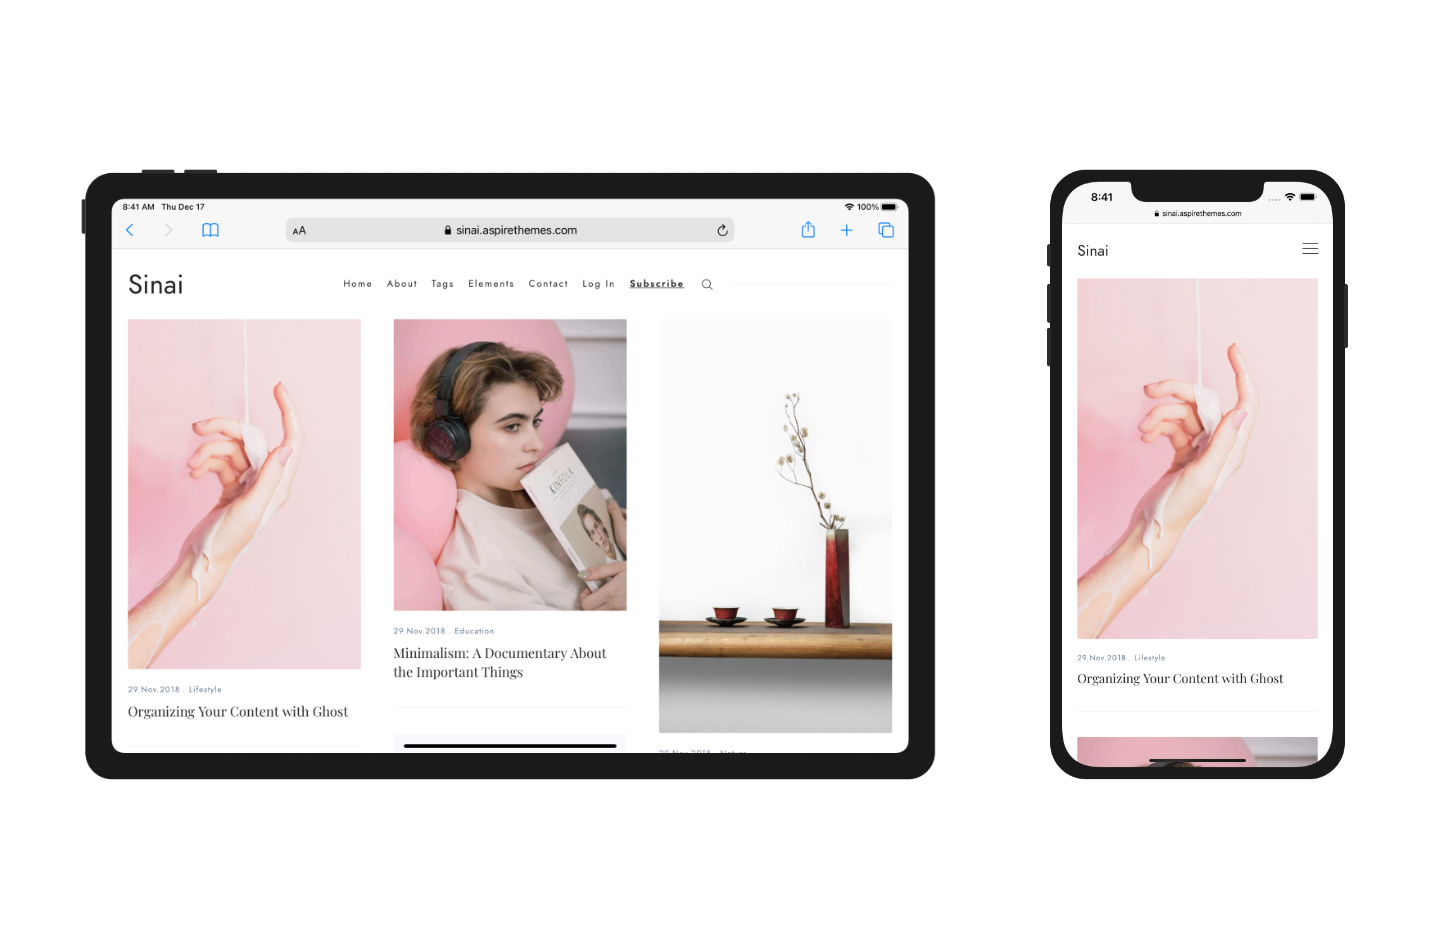 Sinai Theme Responsive Layout on iPhone and iPad